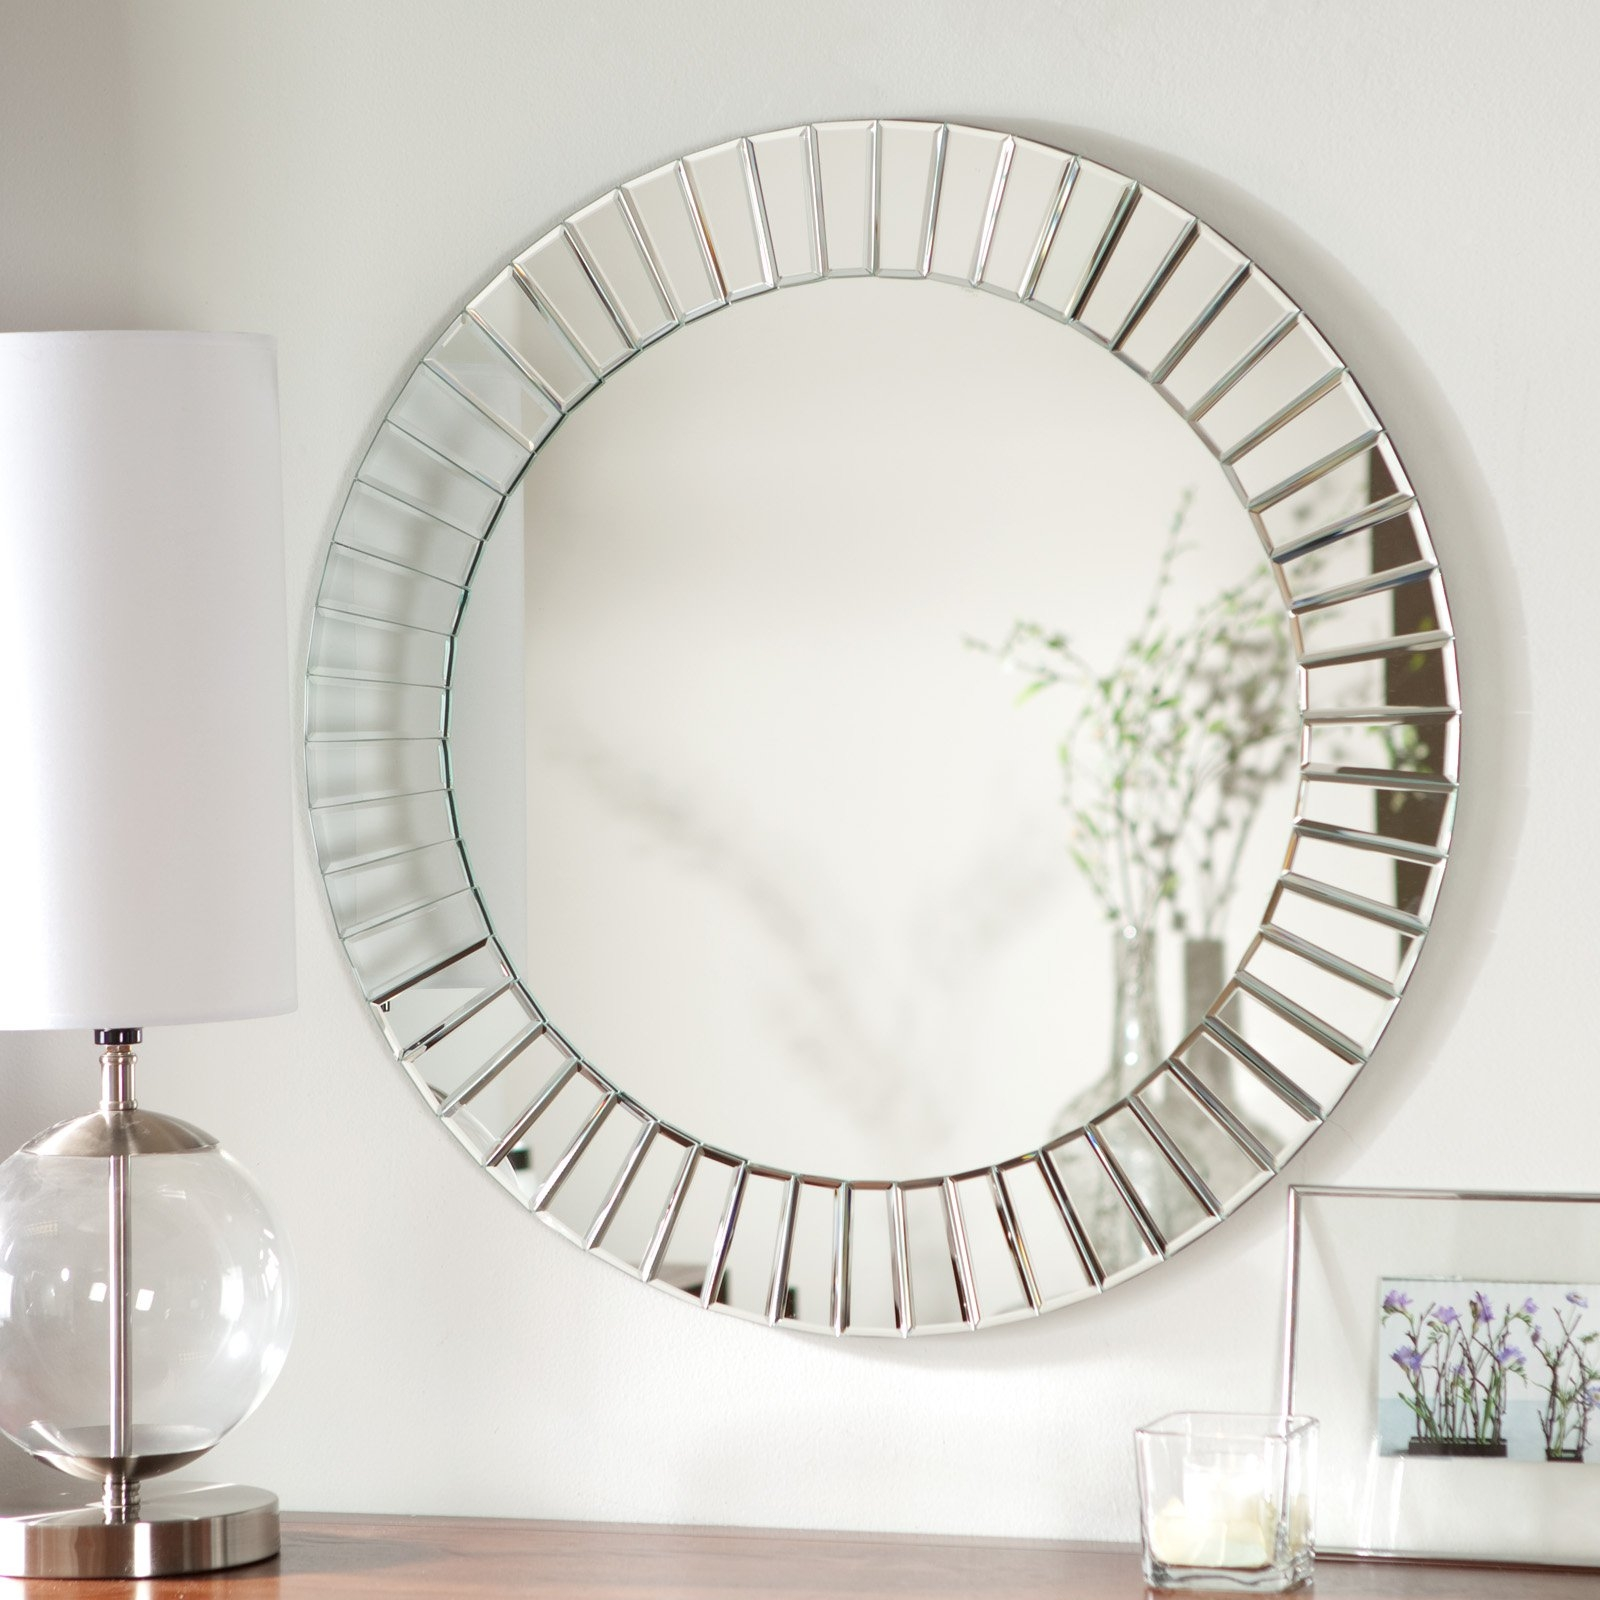 Frameless Beveled Edge Wall Mirrors